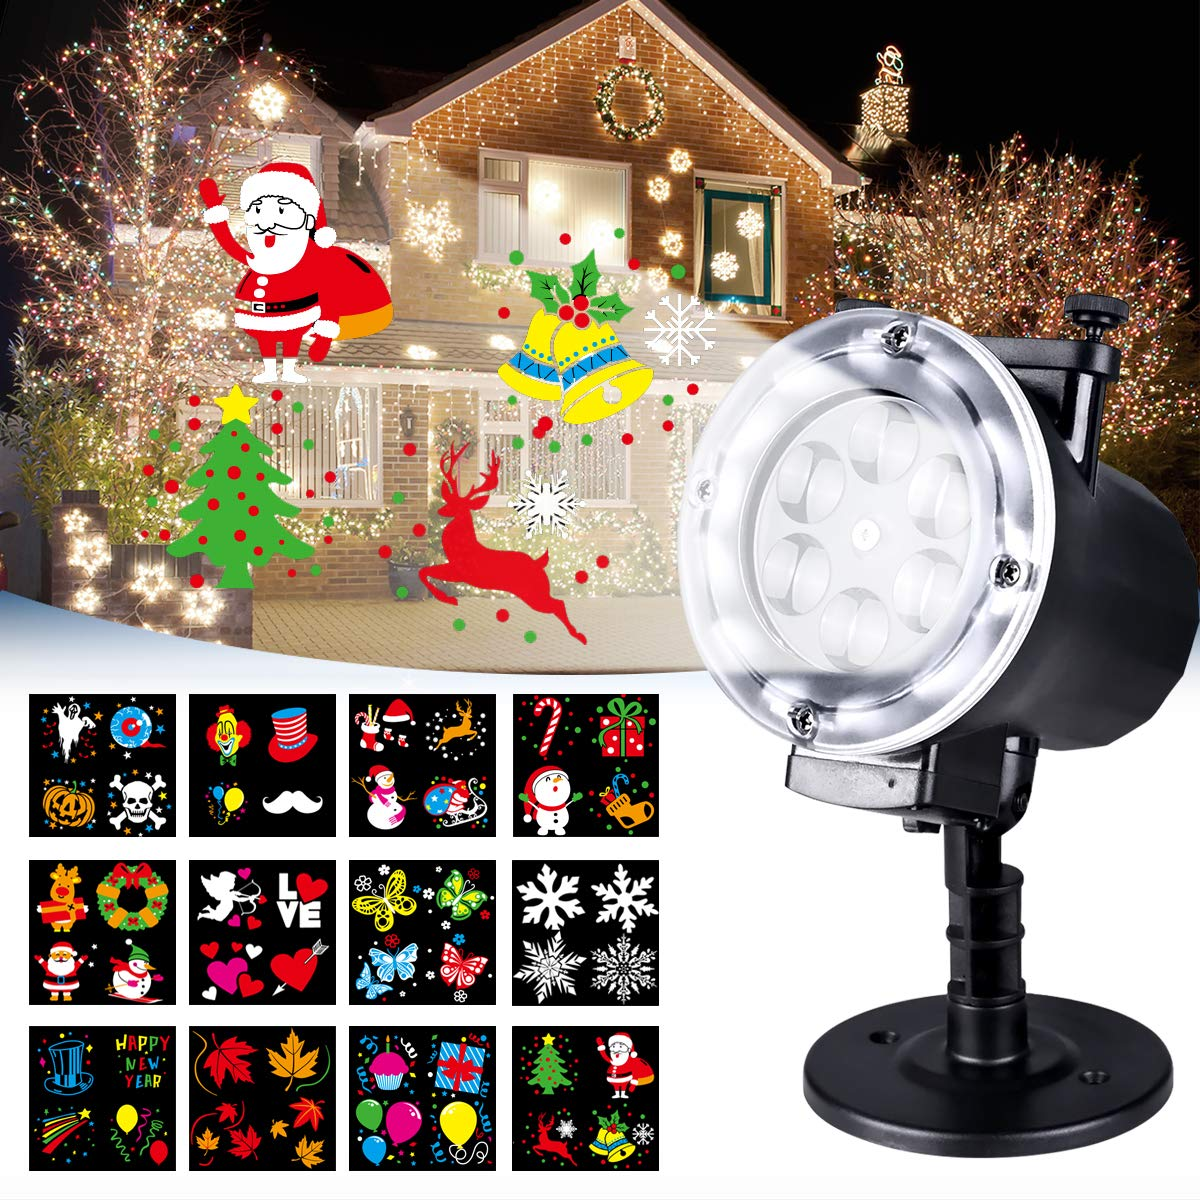 Luces de Proyector, LED Lámpara de Proyección de Navidad para Exterior e Interior Luz de